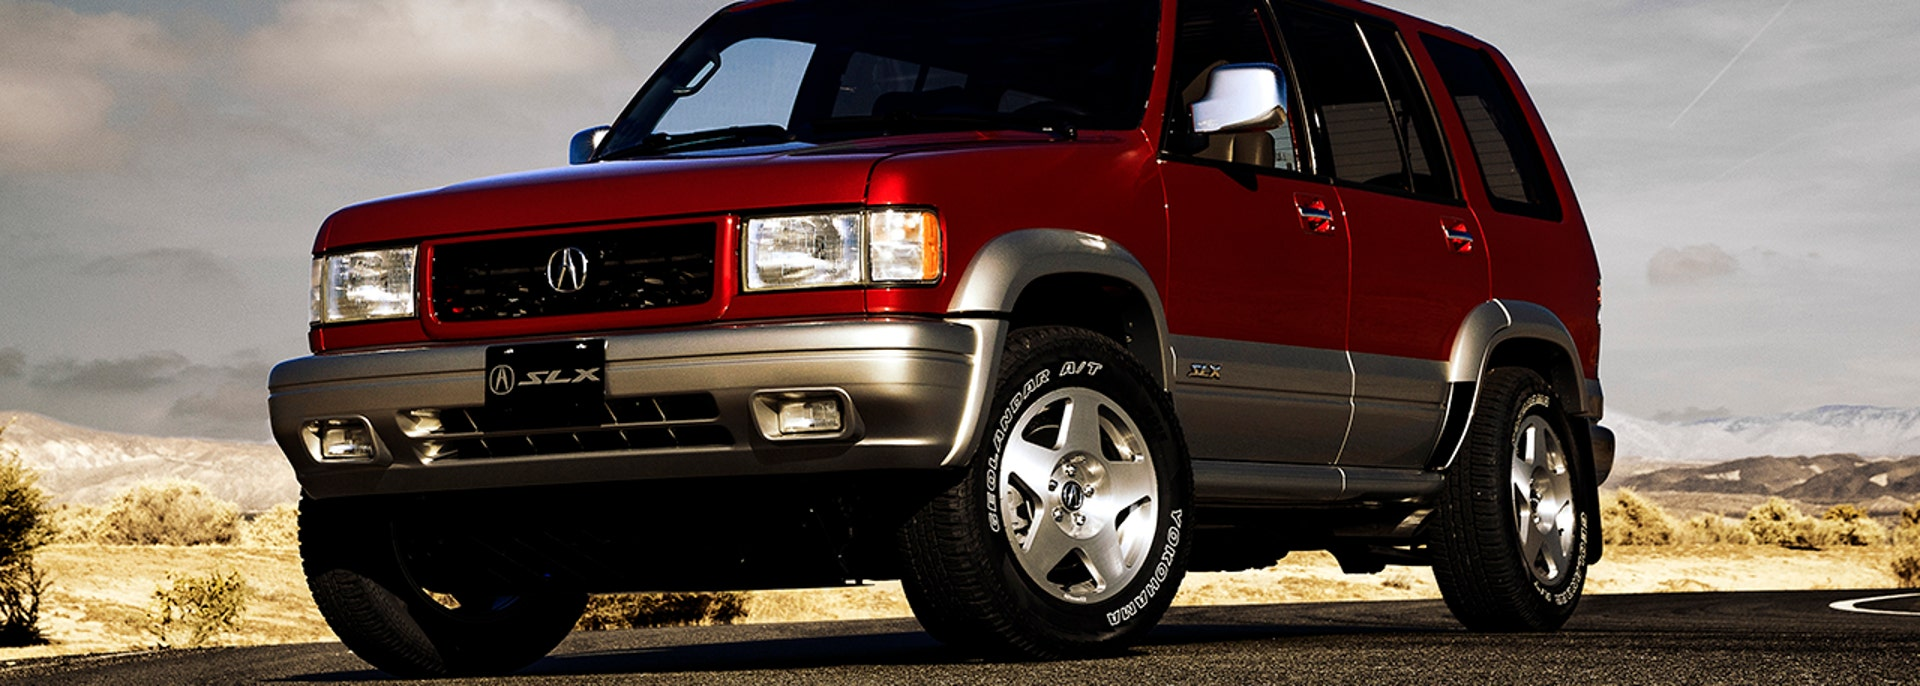 Acura reboots 1996 SLX SUV with latest tech for retro car